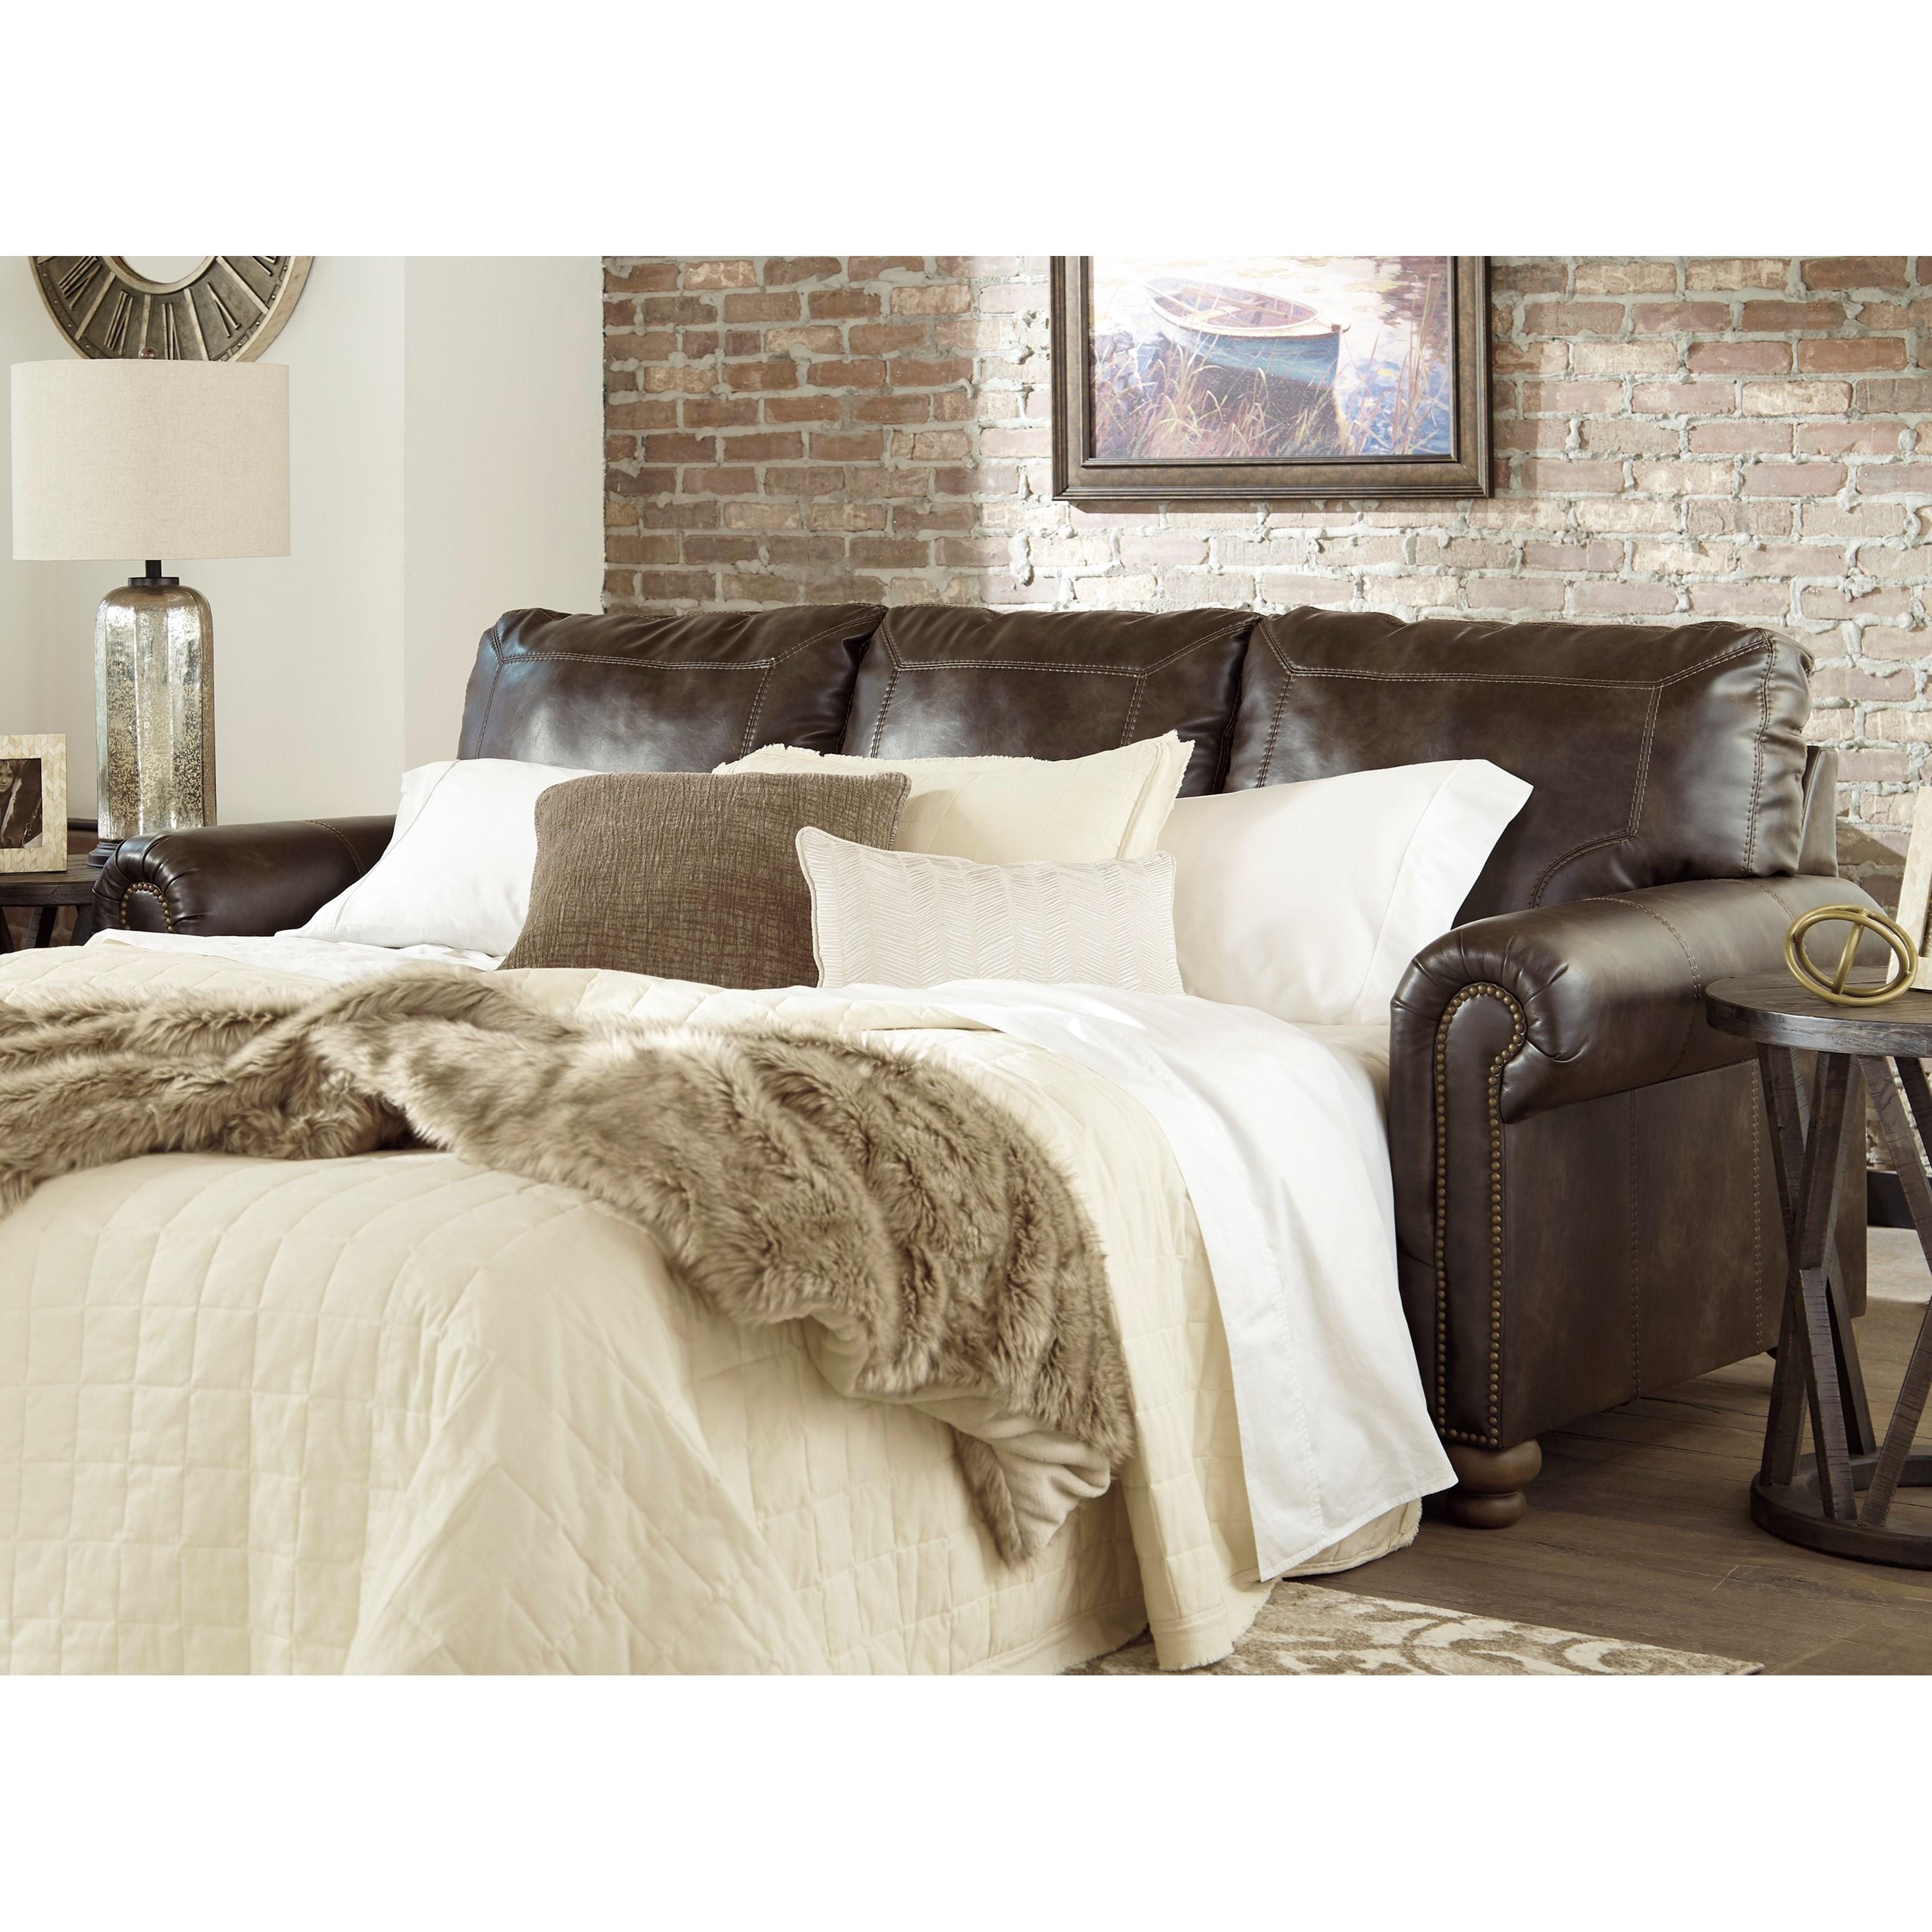 Ashley Furniture Prices Online: Ashley Signature Design Nicorvo Traditional Queen Sofa